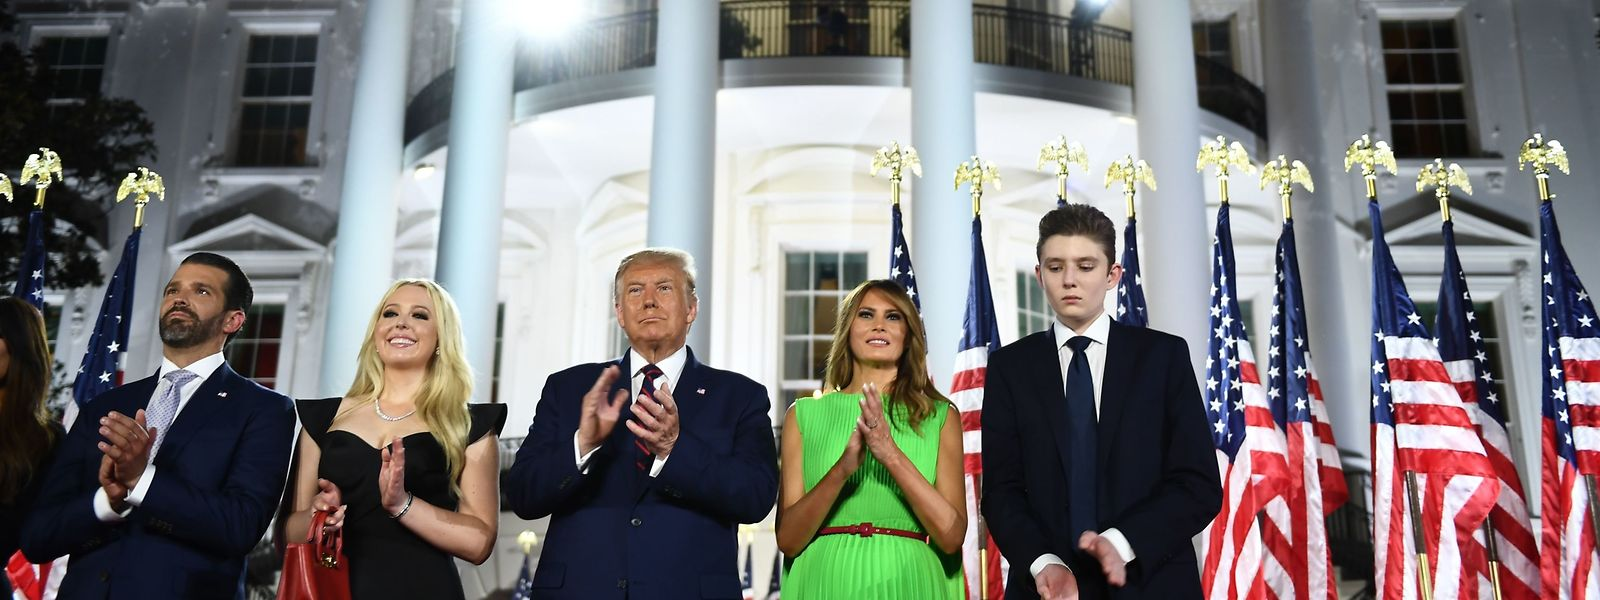 (R-L) Barron Trump, First Lady Melania Trump, US-Präsident Donald Trump, Tiffany Trump und Donald Trump Jr. sehen sich die Feuerwerke über Washington DC an.